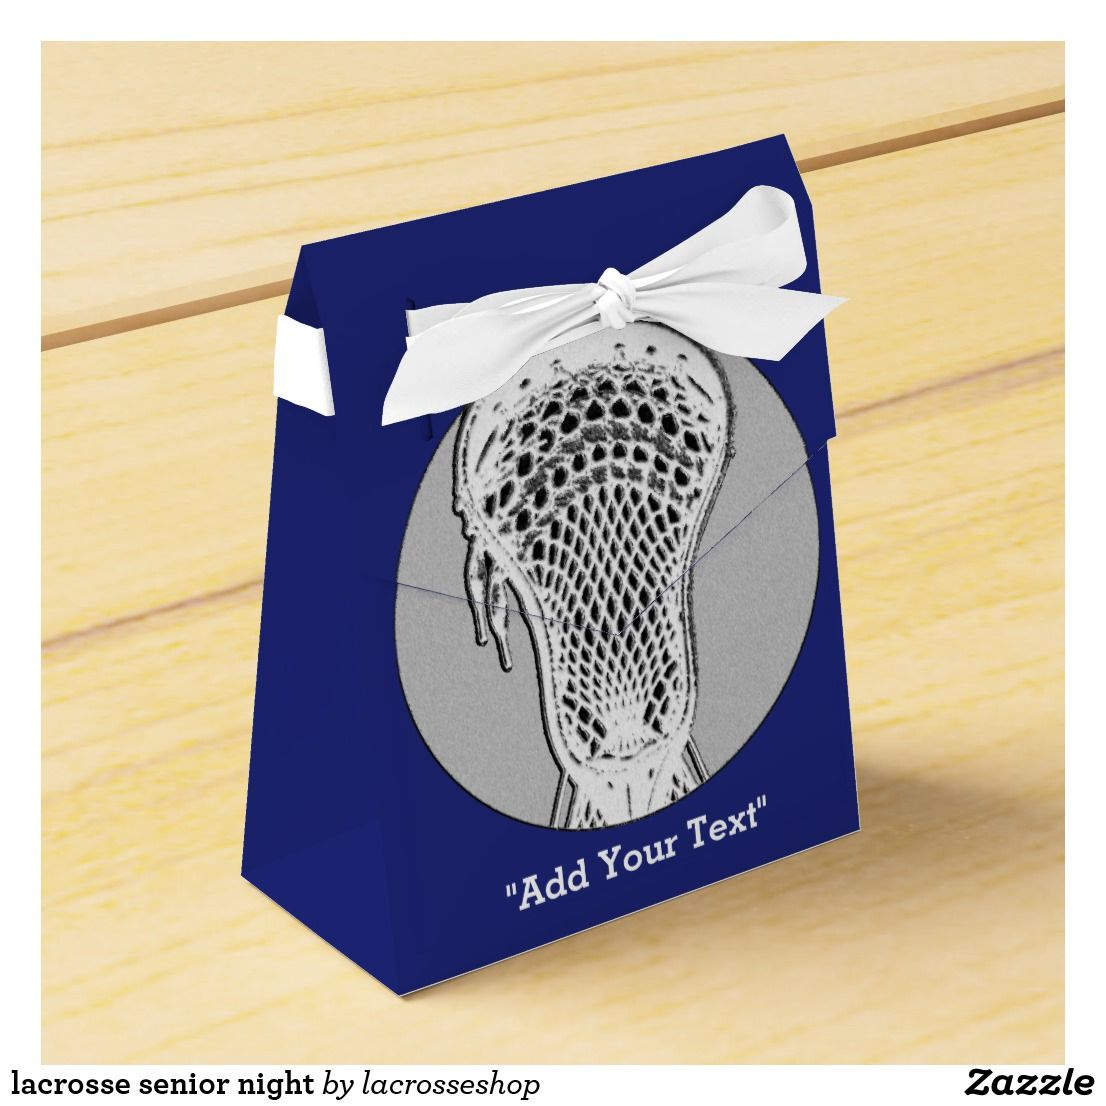 Gifts For Wedding Night: Lacrosse Senior Night Favor Box